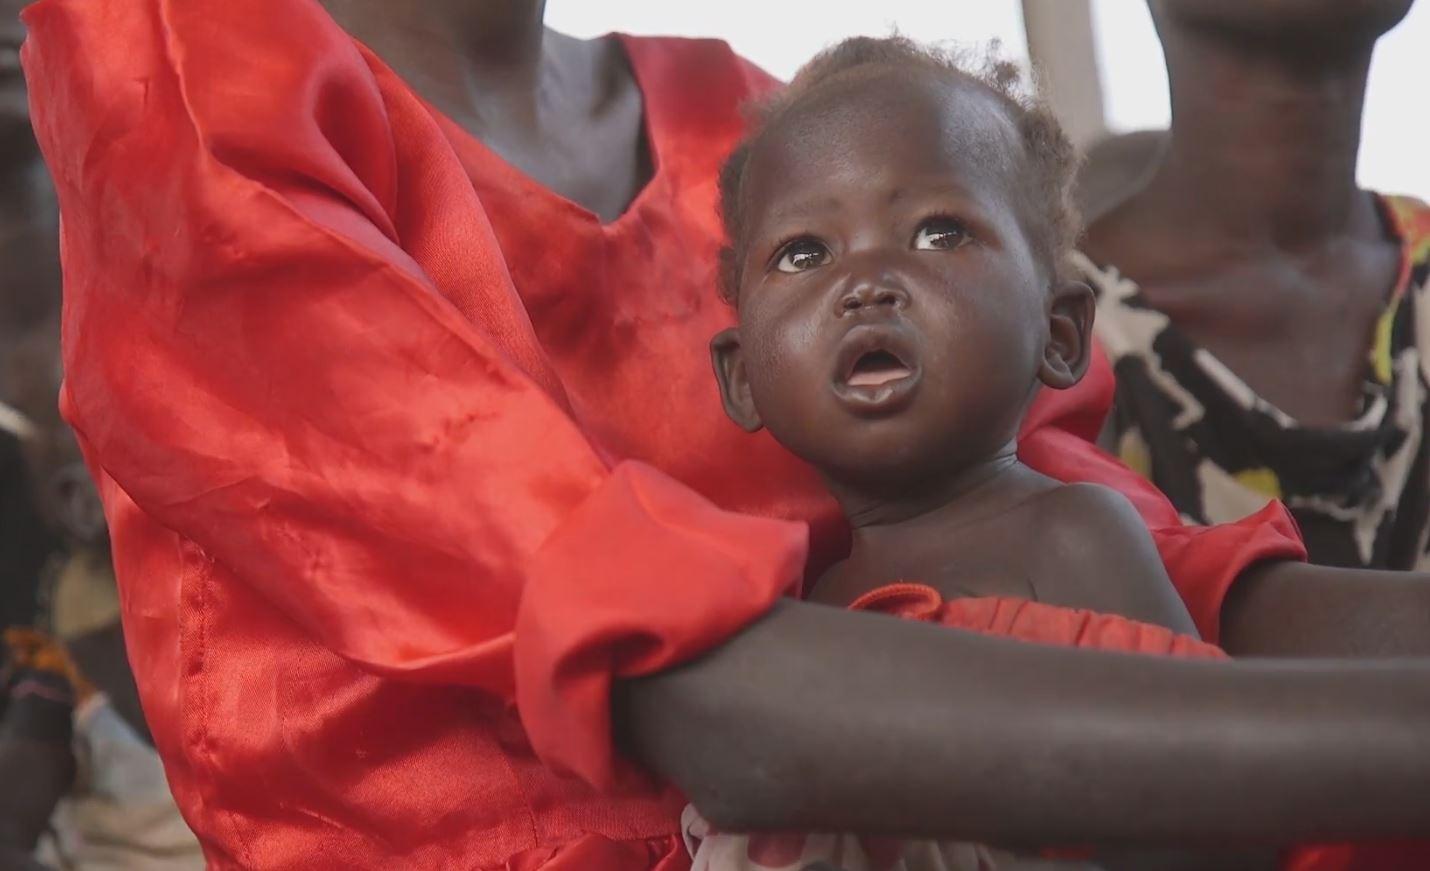 UNICEF warns of famine in South Sudan